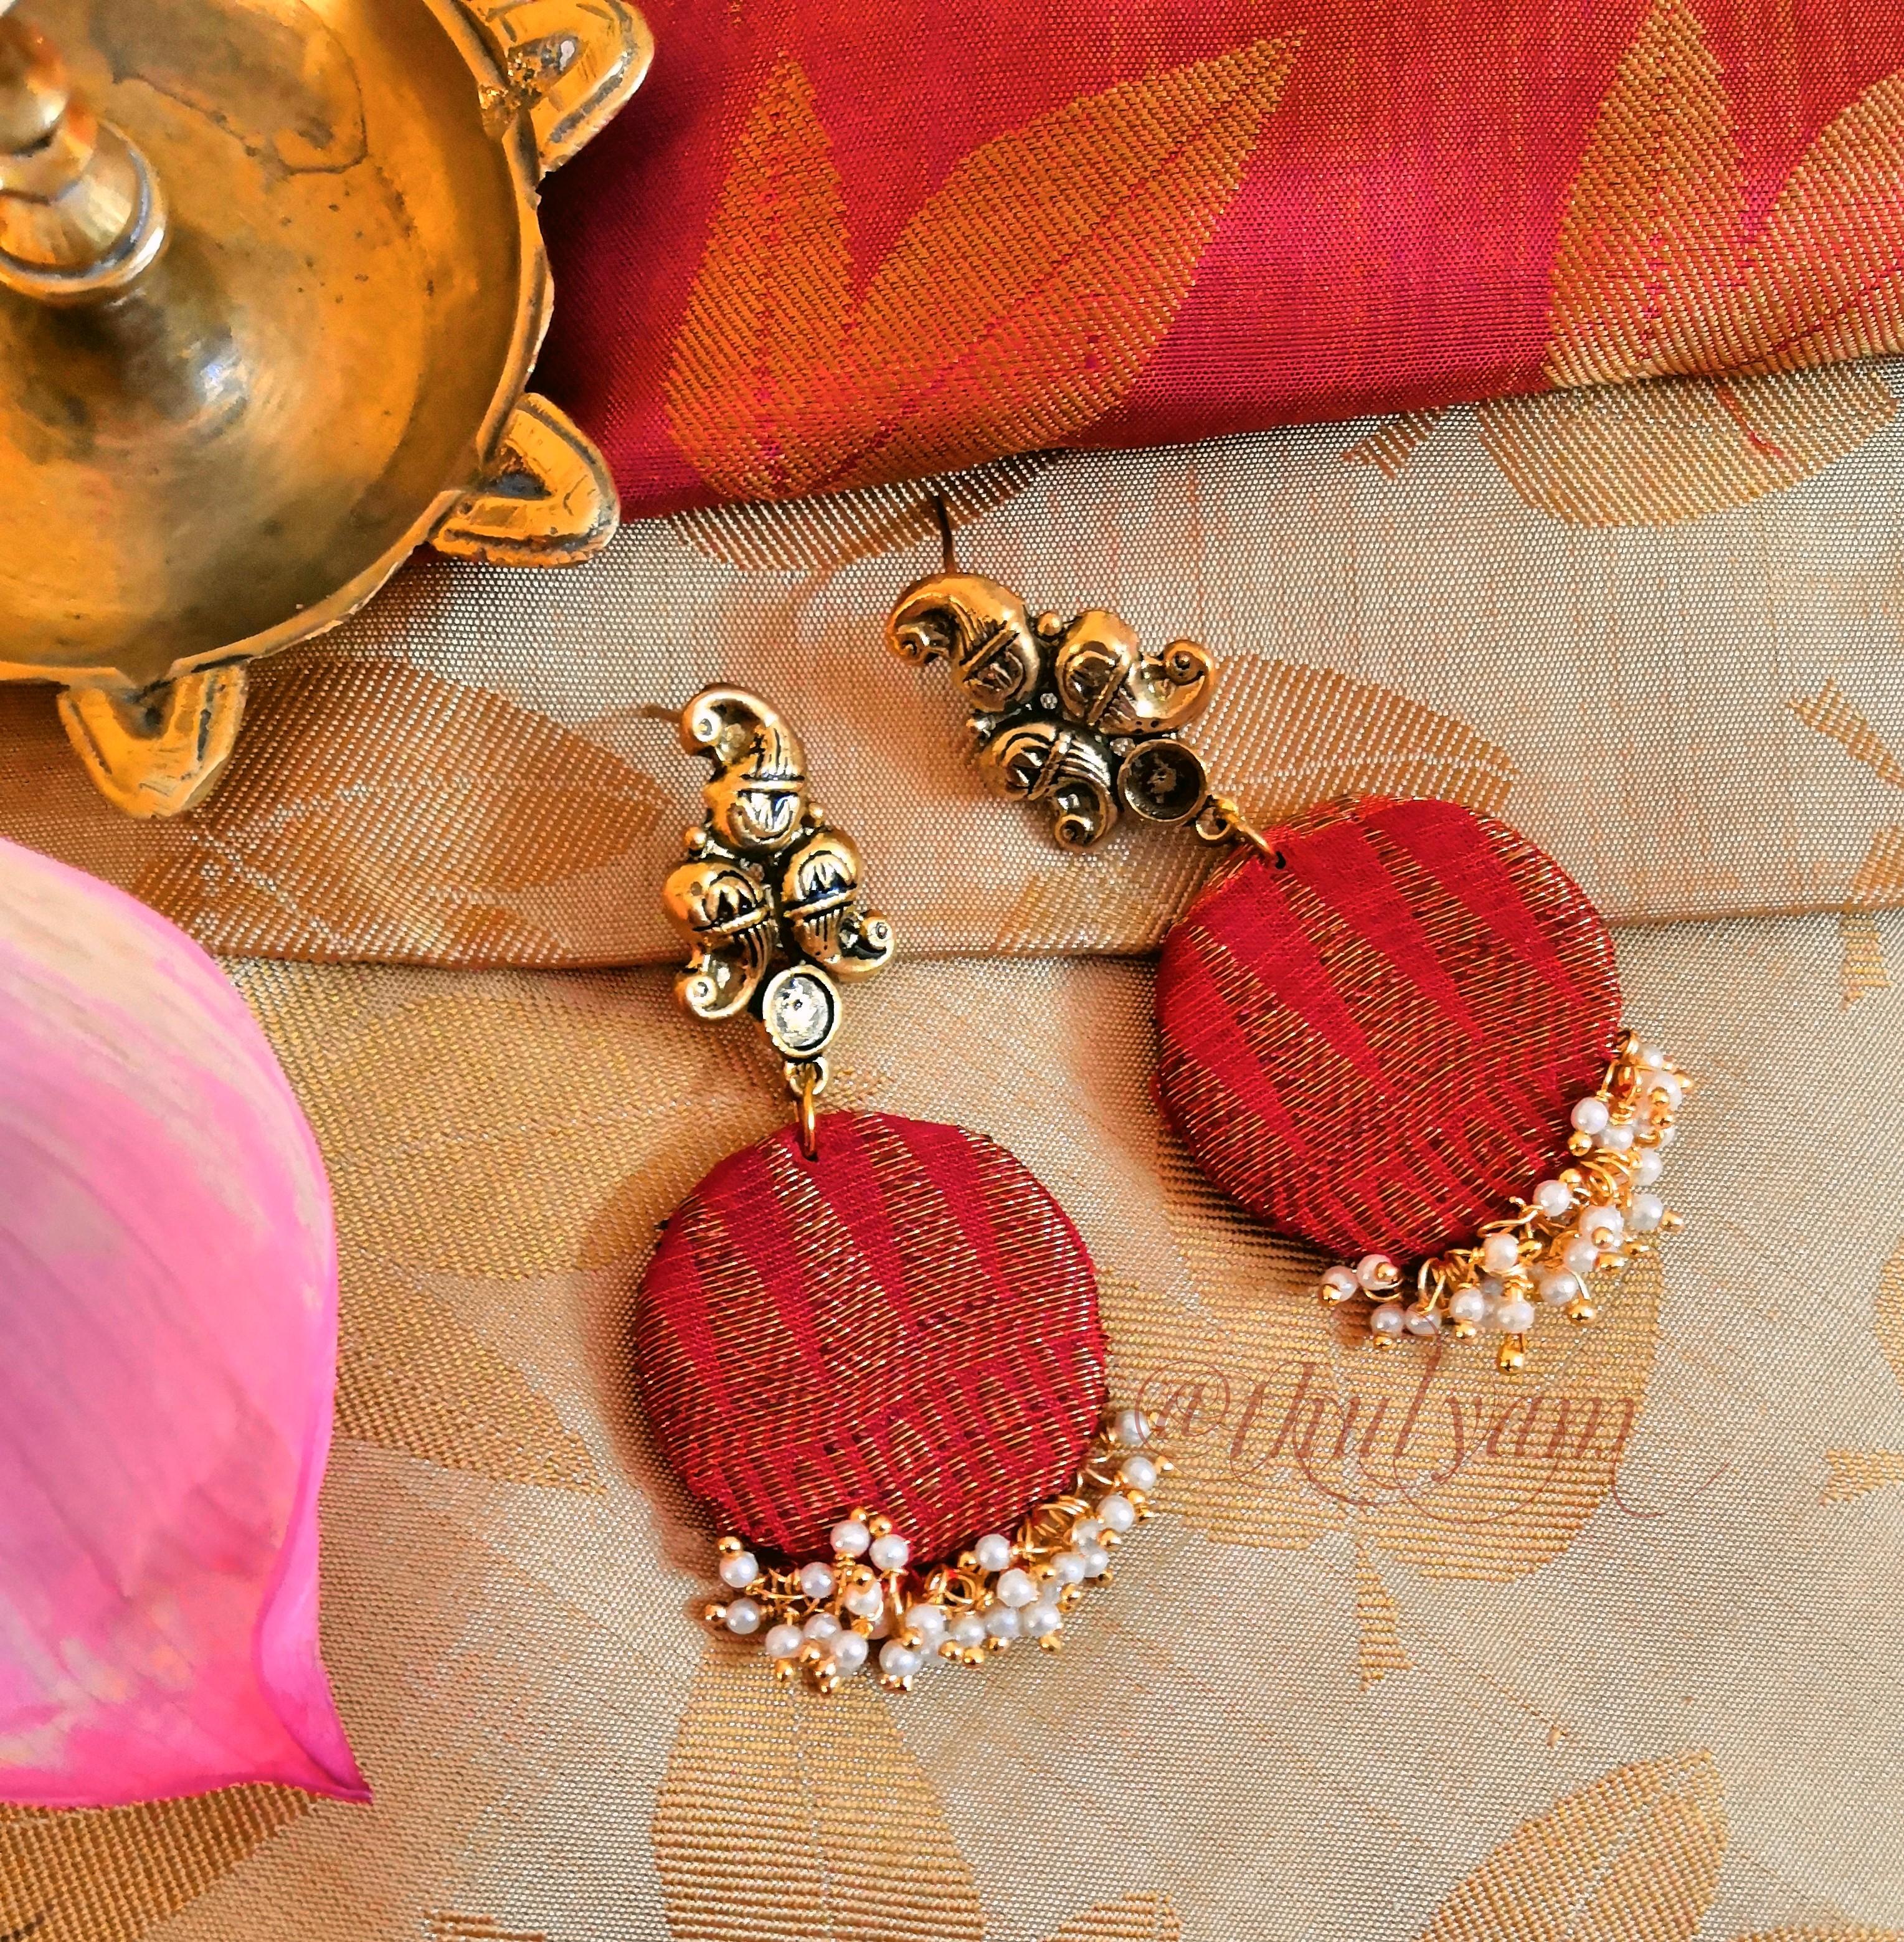 Athulyam – By Geetha Sunil